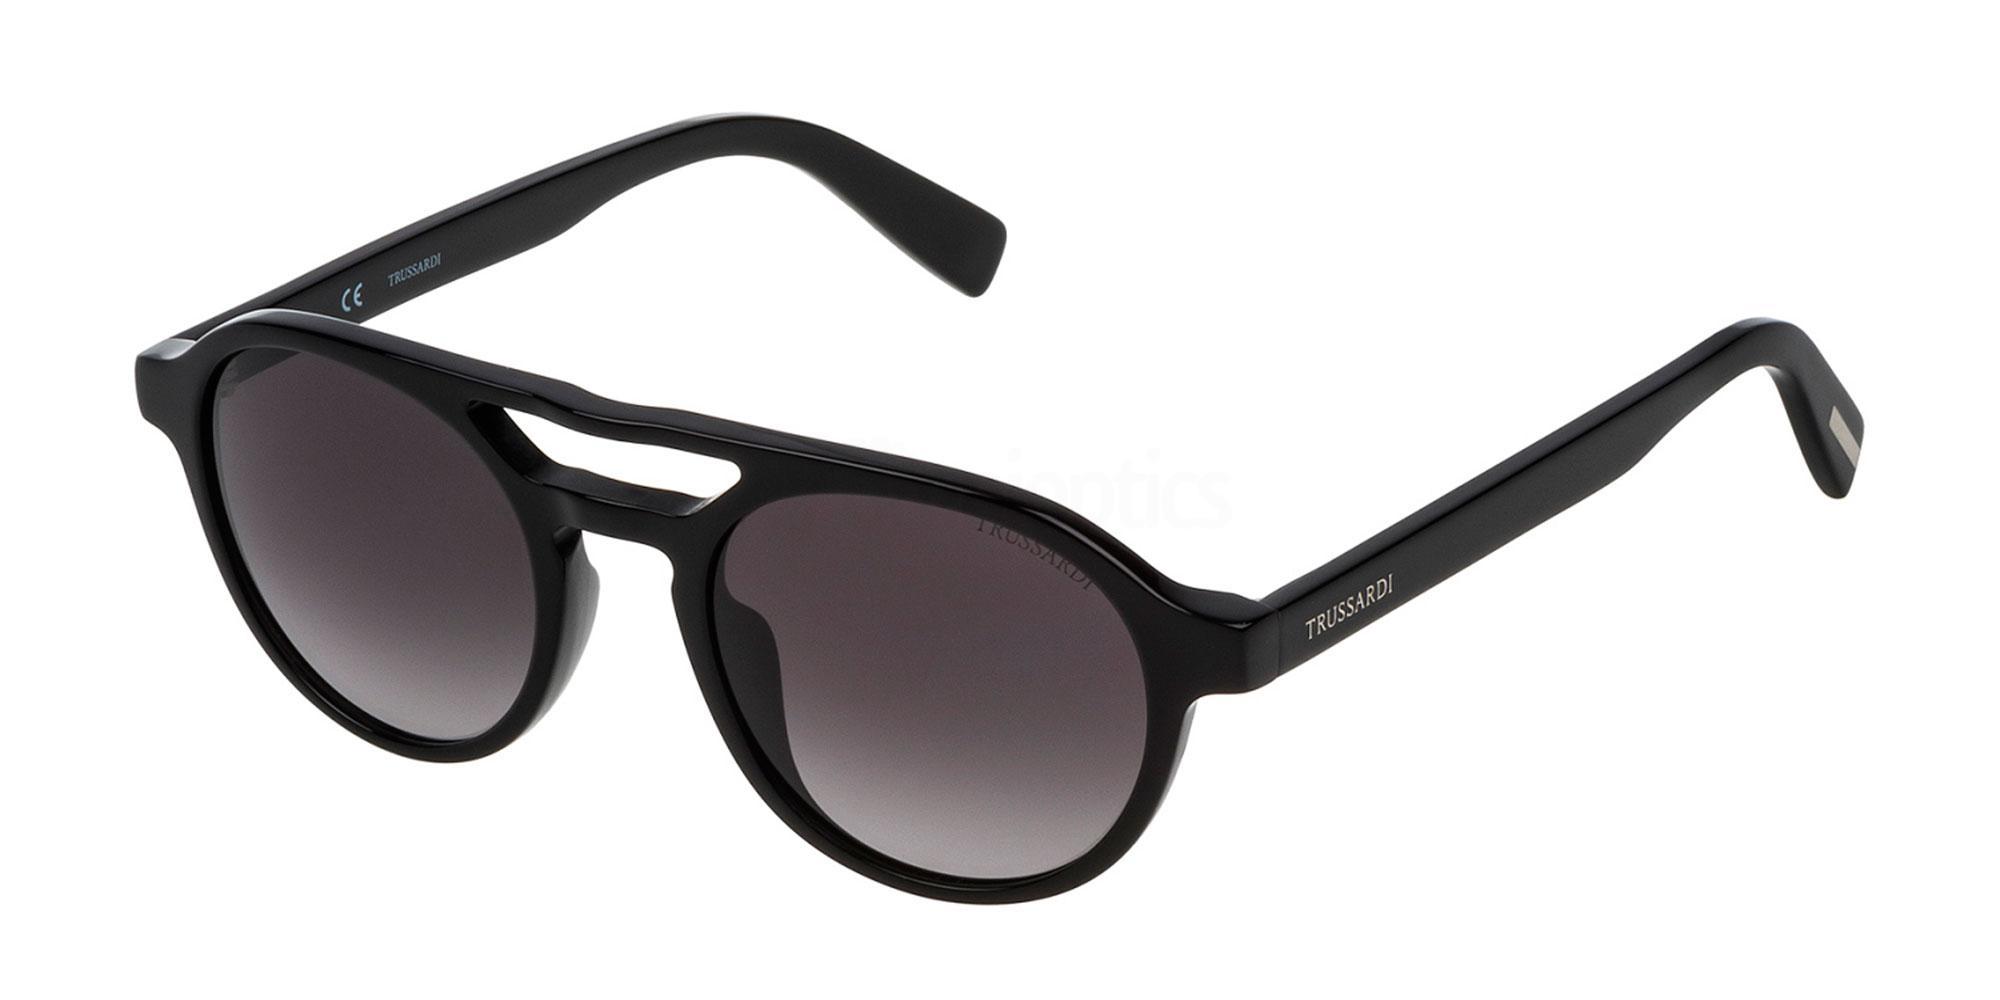 0700 STR083 Sunglasses, Trussardi